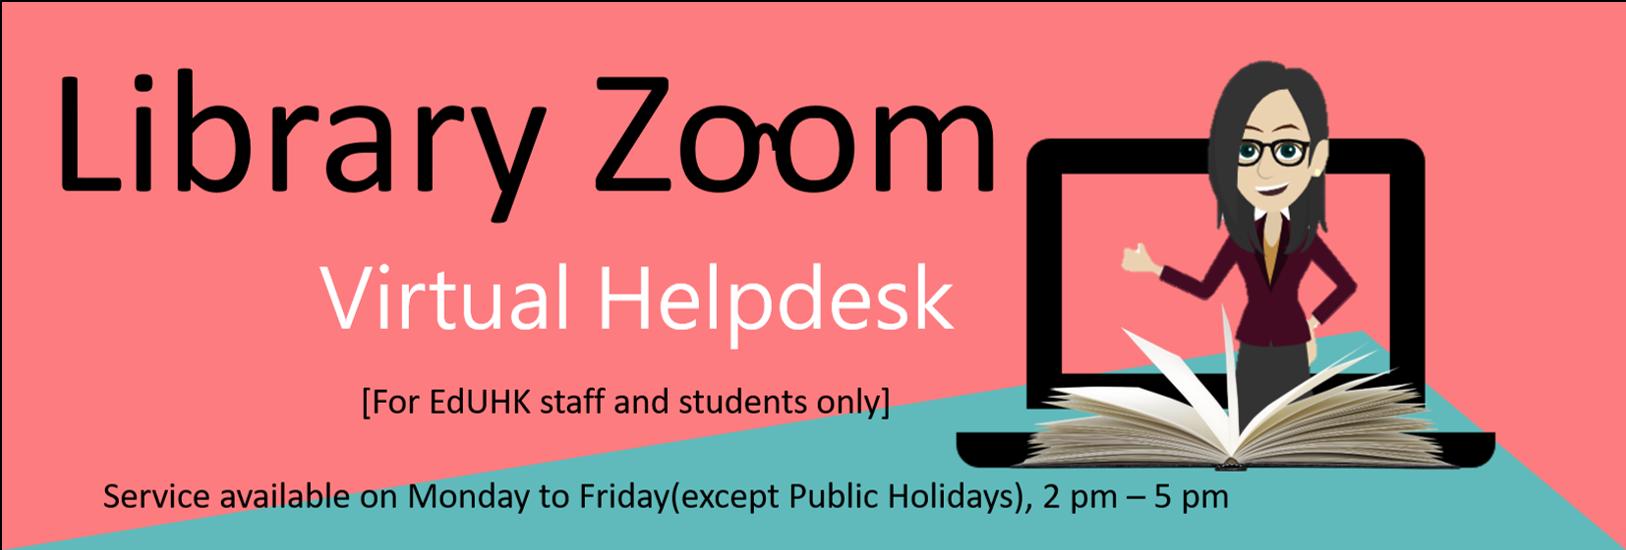 Library Zoom: EdUHK Library Virtual Helpdesk